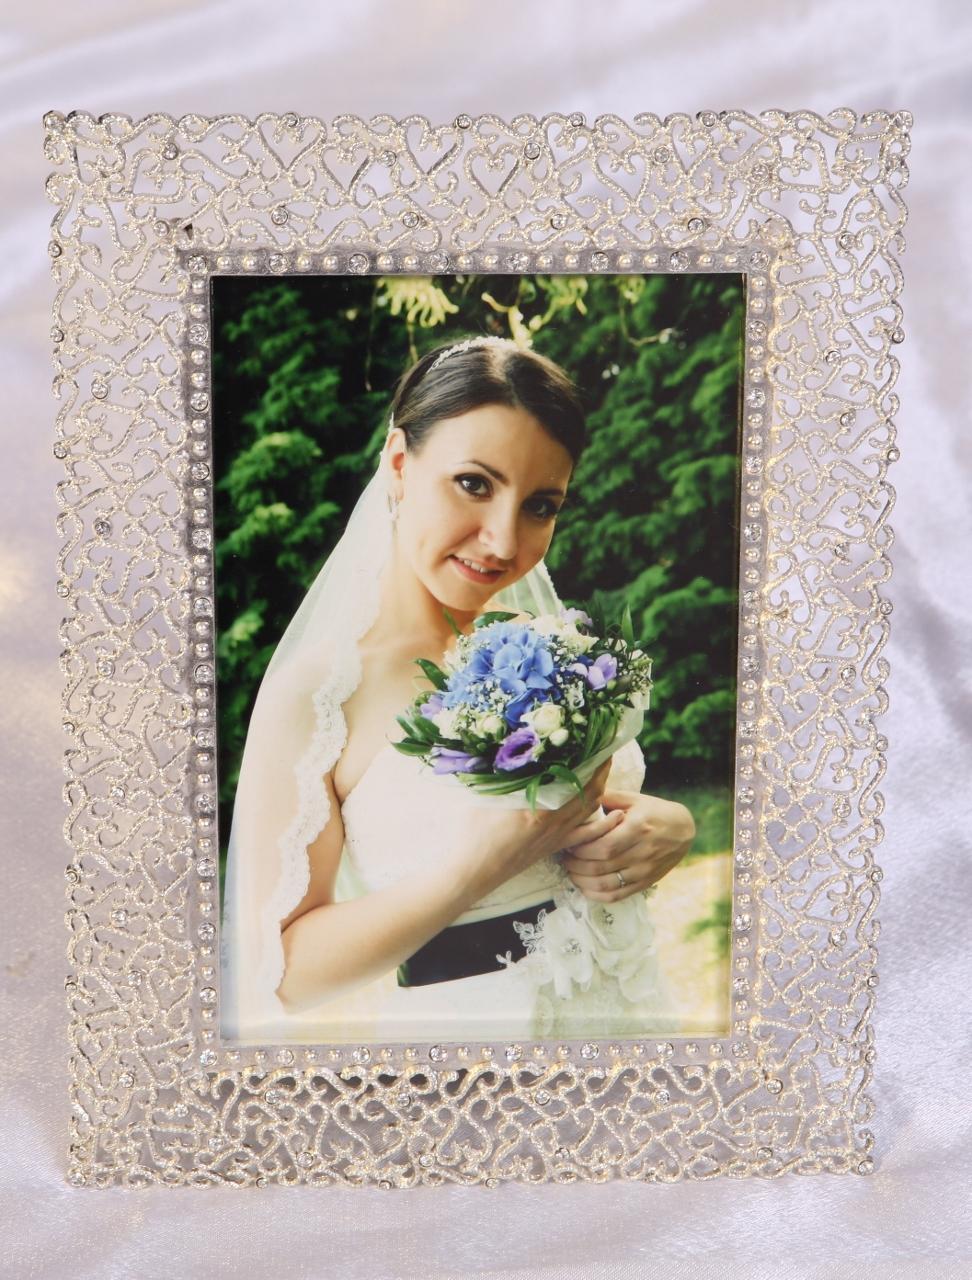 Fotorámeček  SILVER  WEDDING 13x18/M269